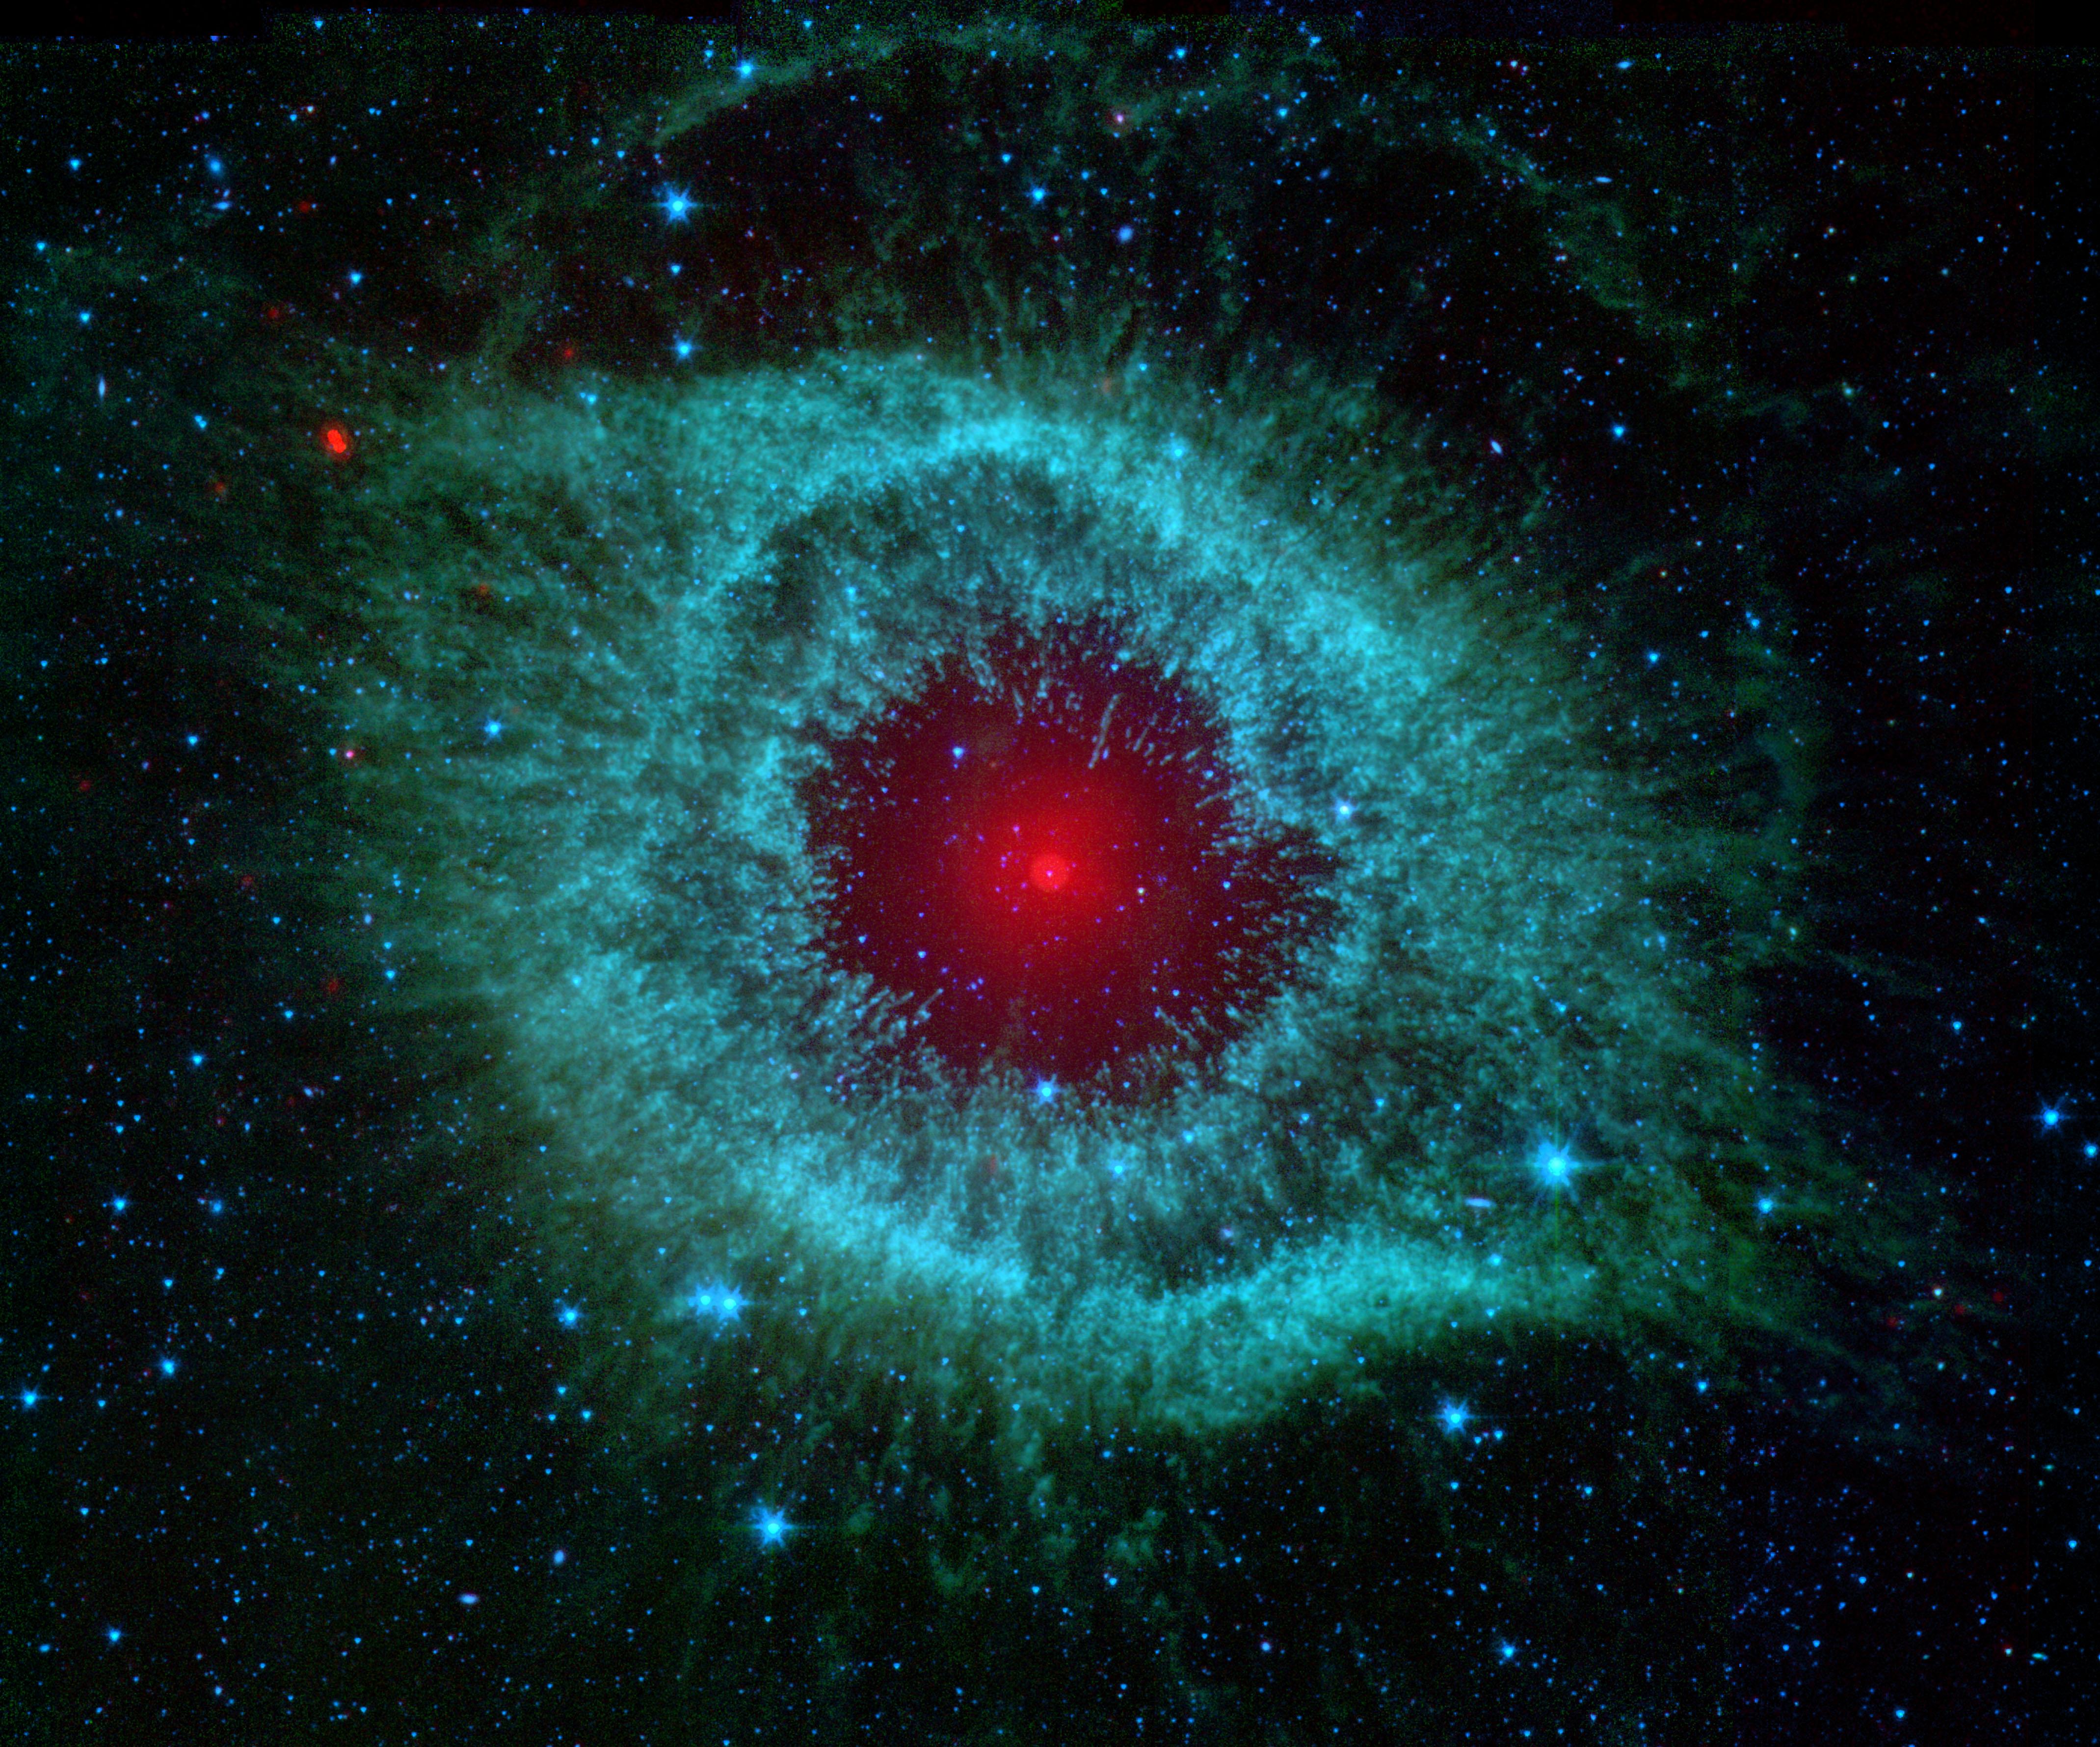 Accretion (astrophysics) - Wikipedia